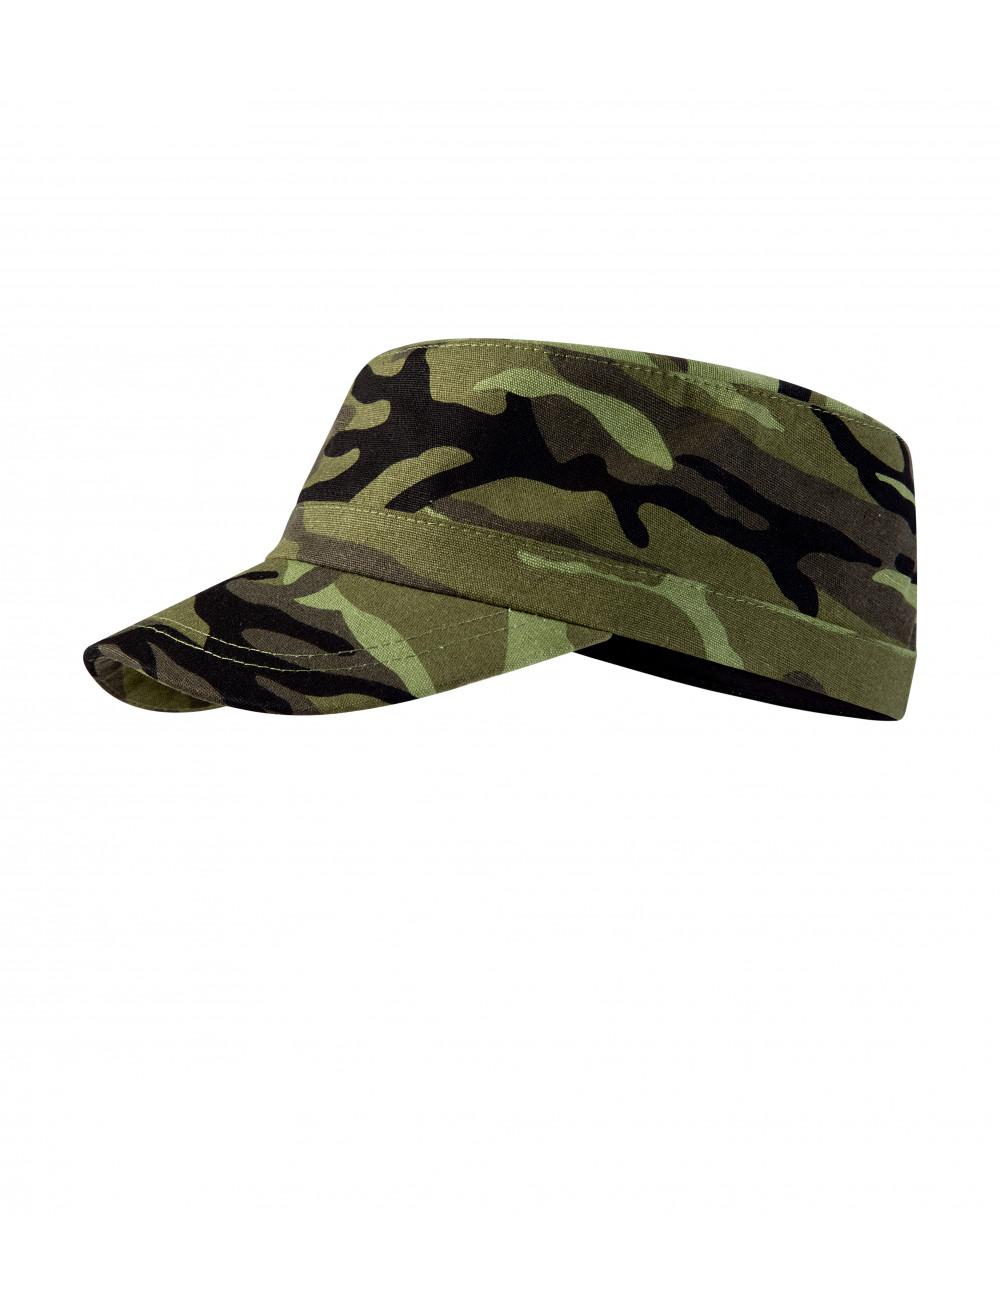 Adler MALFINI Czapka unisex Camo Latino C24 camouflage green